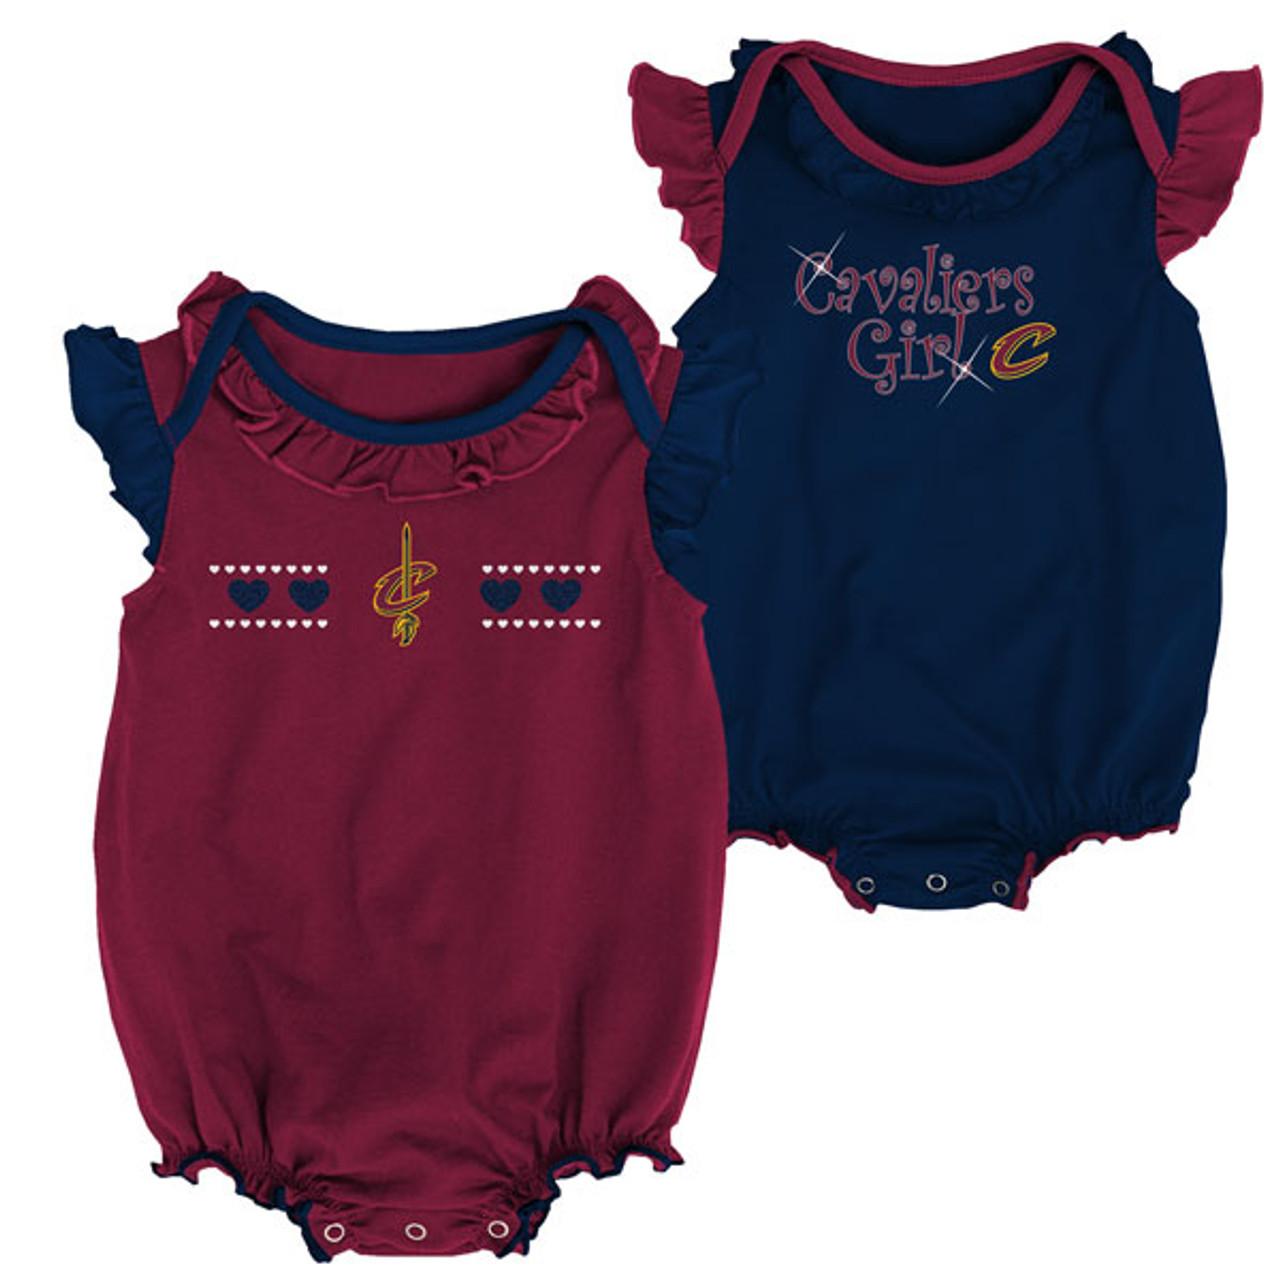 newest collection e94be b43d2 Newborn Cavs Girl 2 Piece Onesie Set